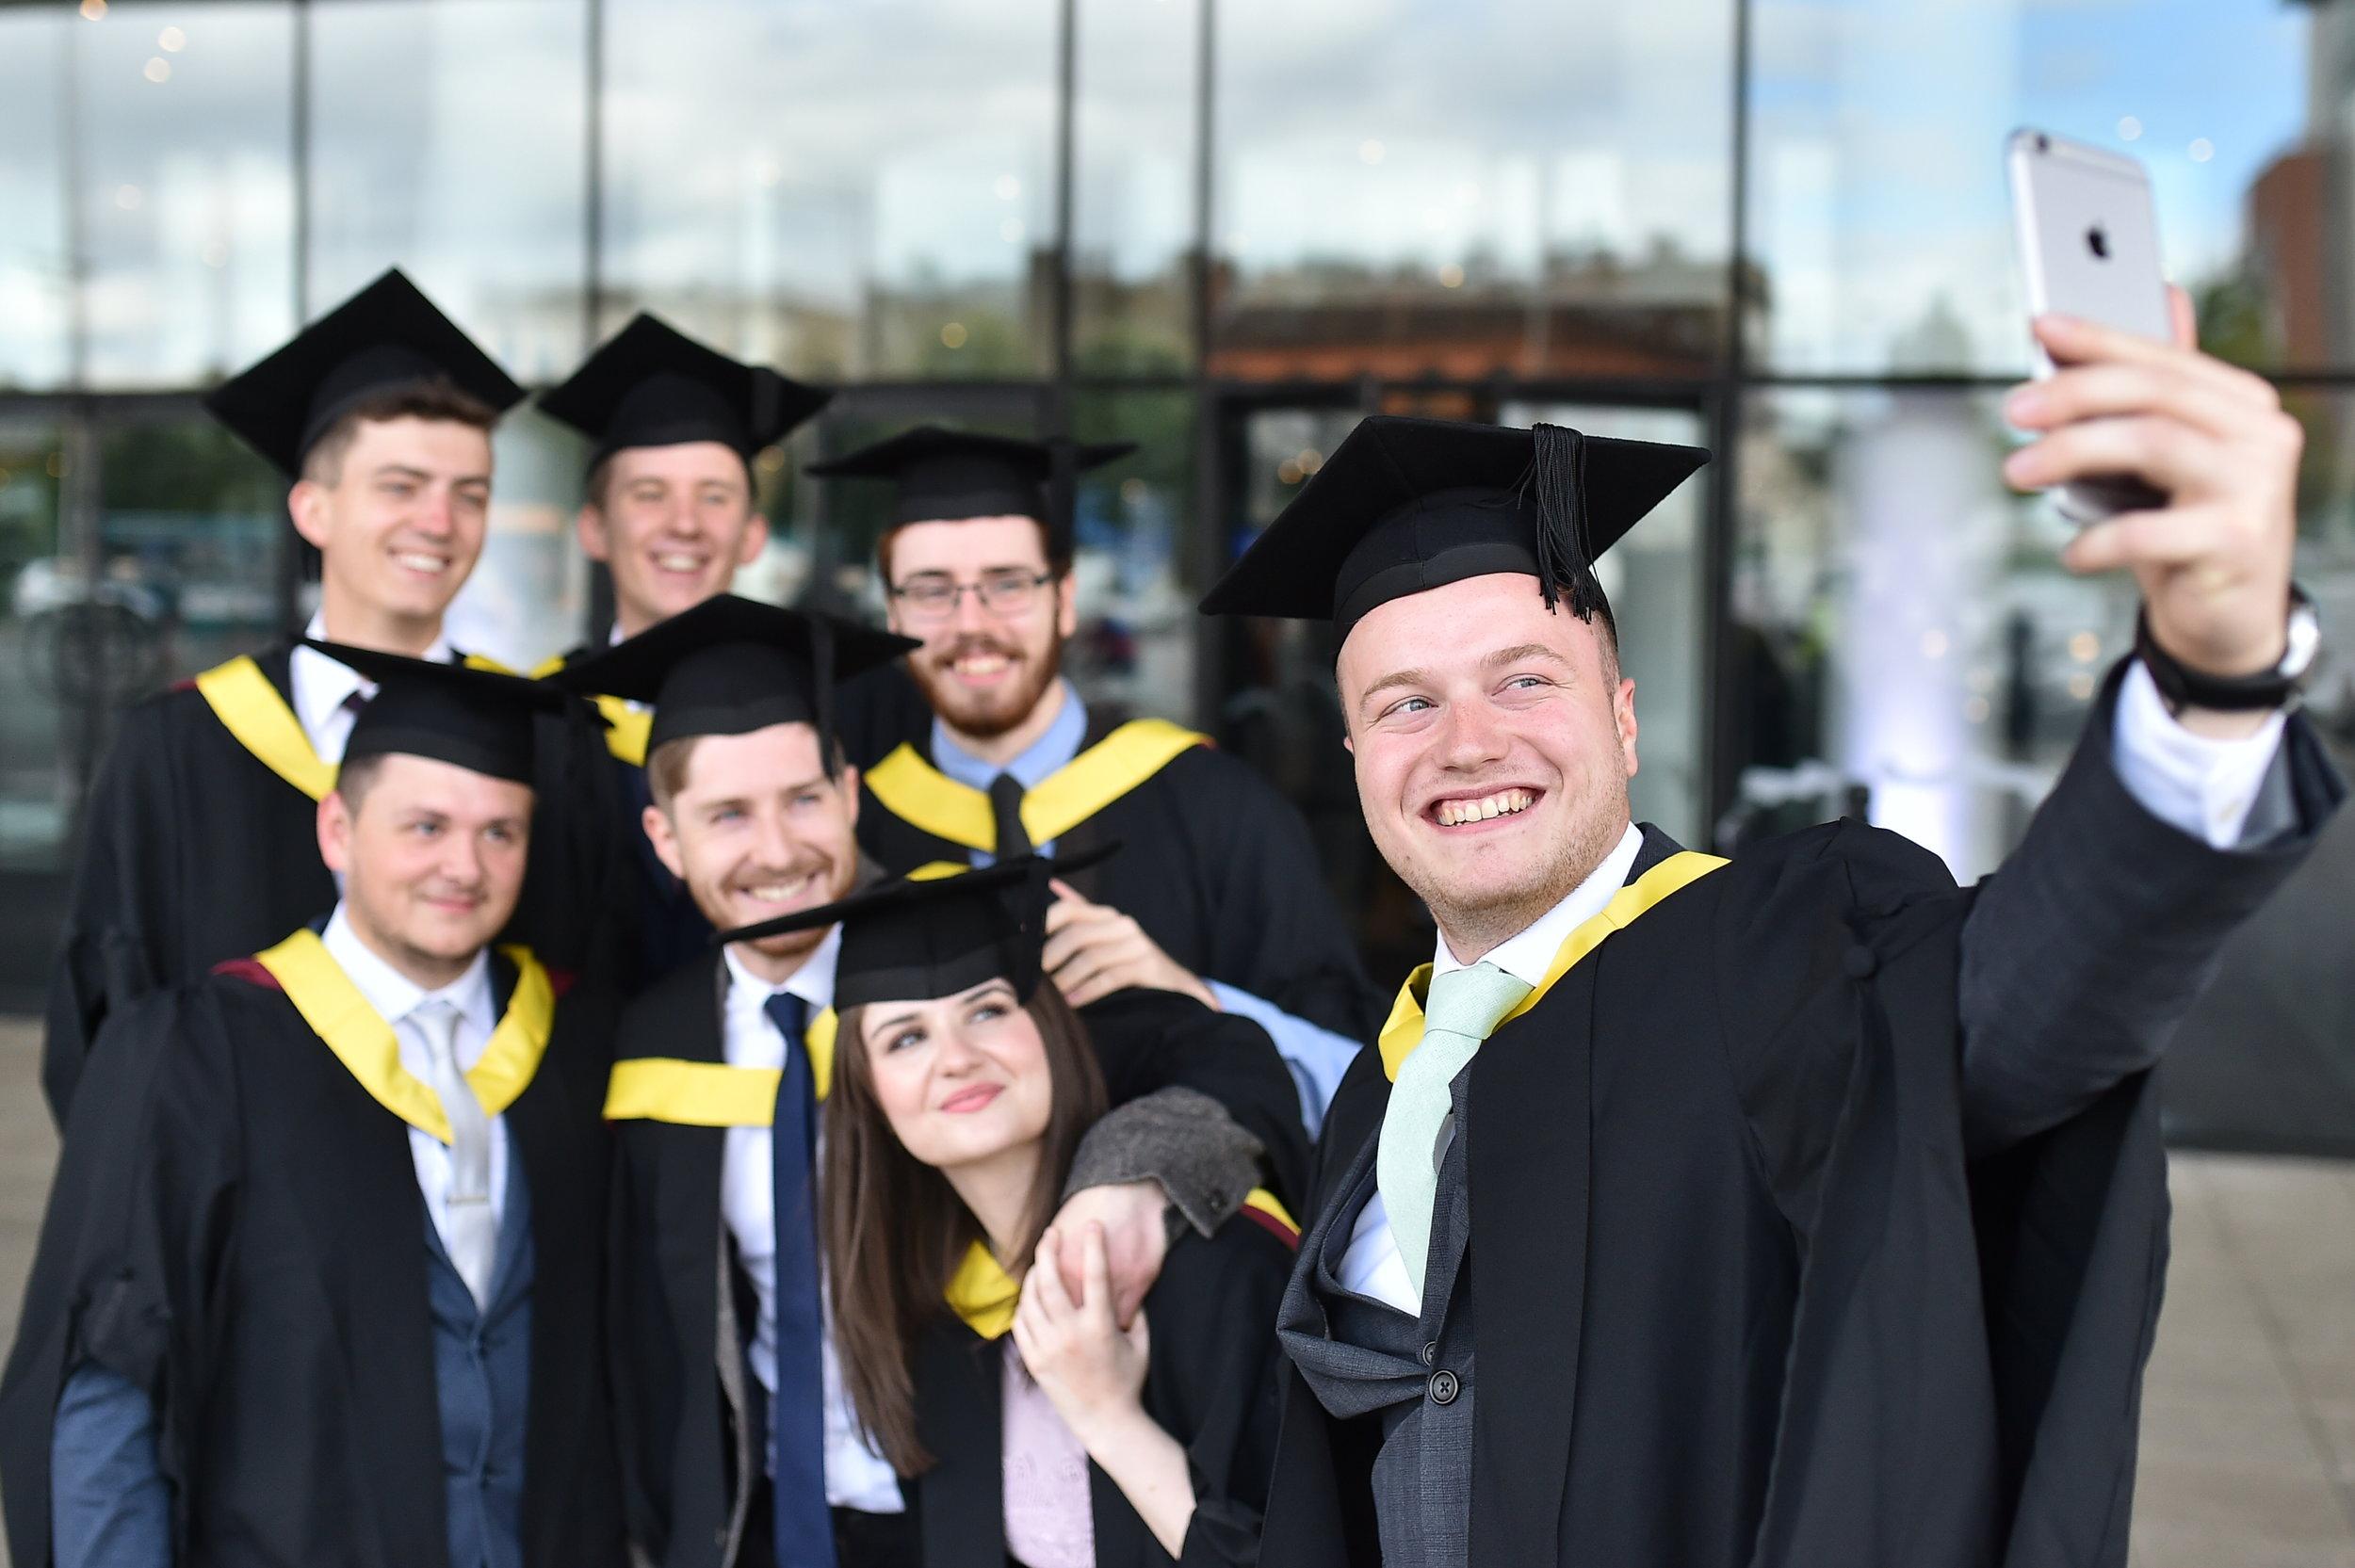 cardiff_met_graduation